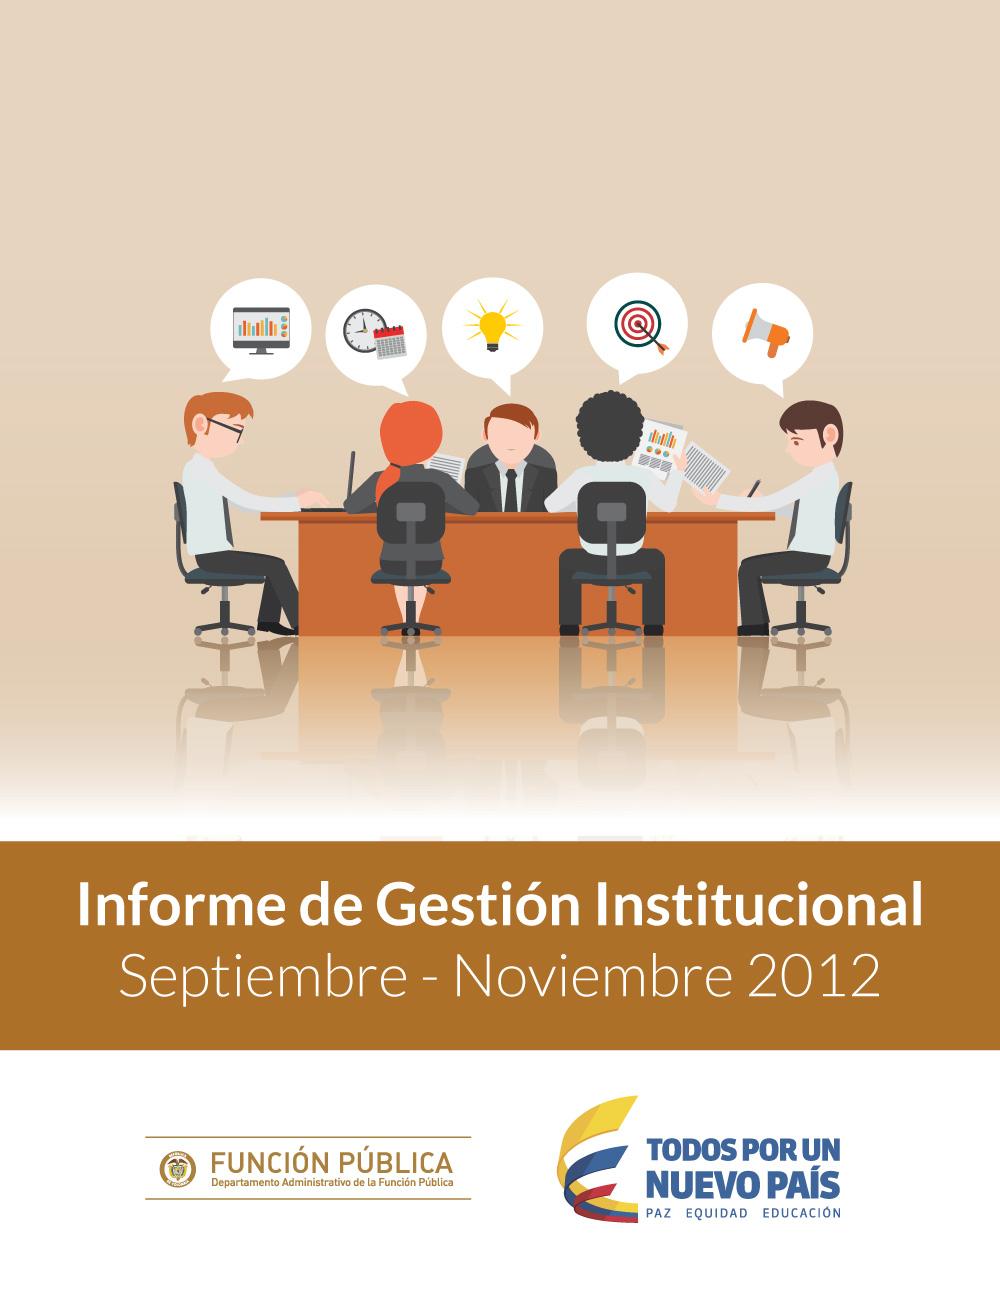 Informe de Gestión Institucional de Sept. a Nov. de 2012.